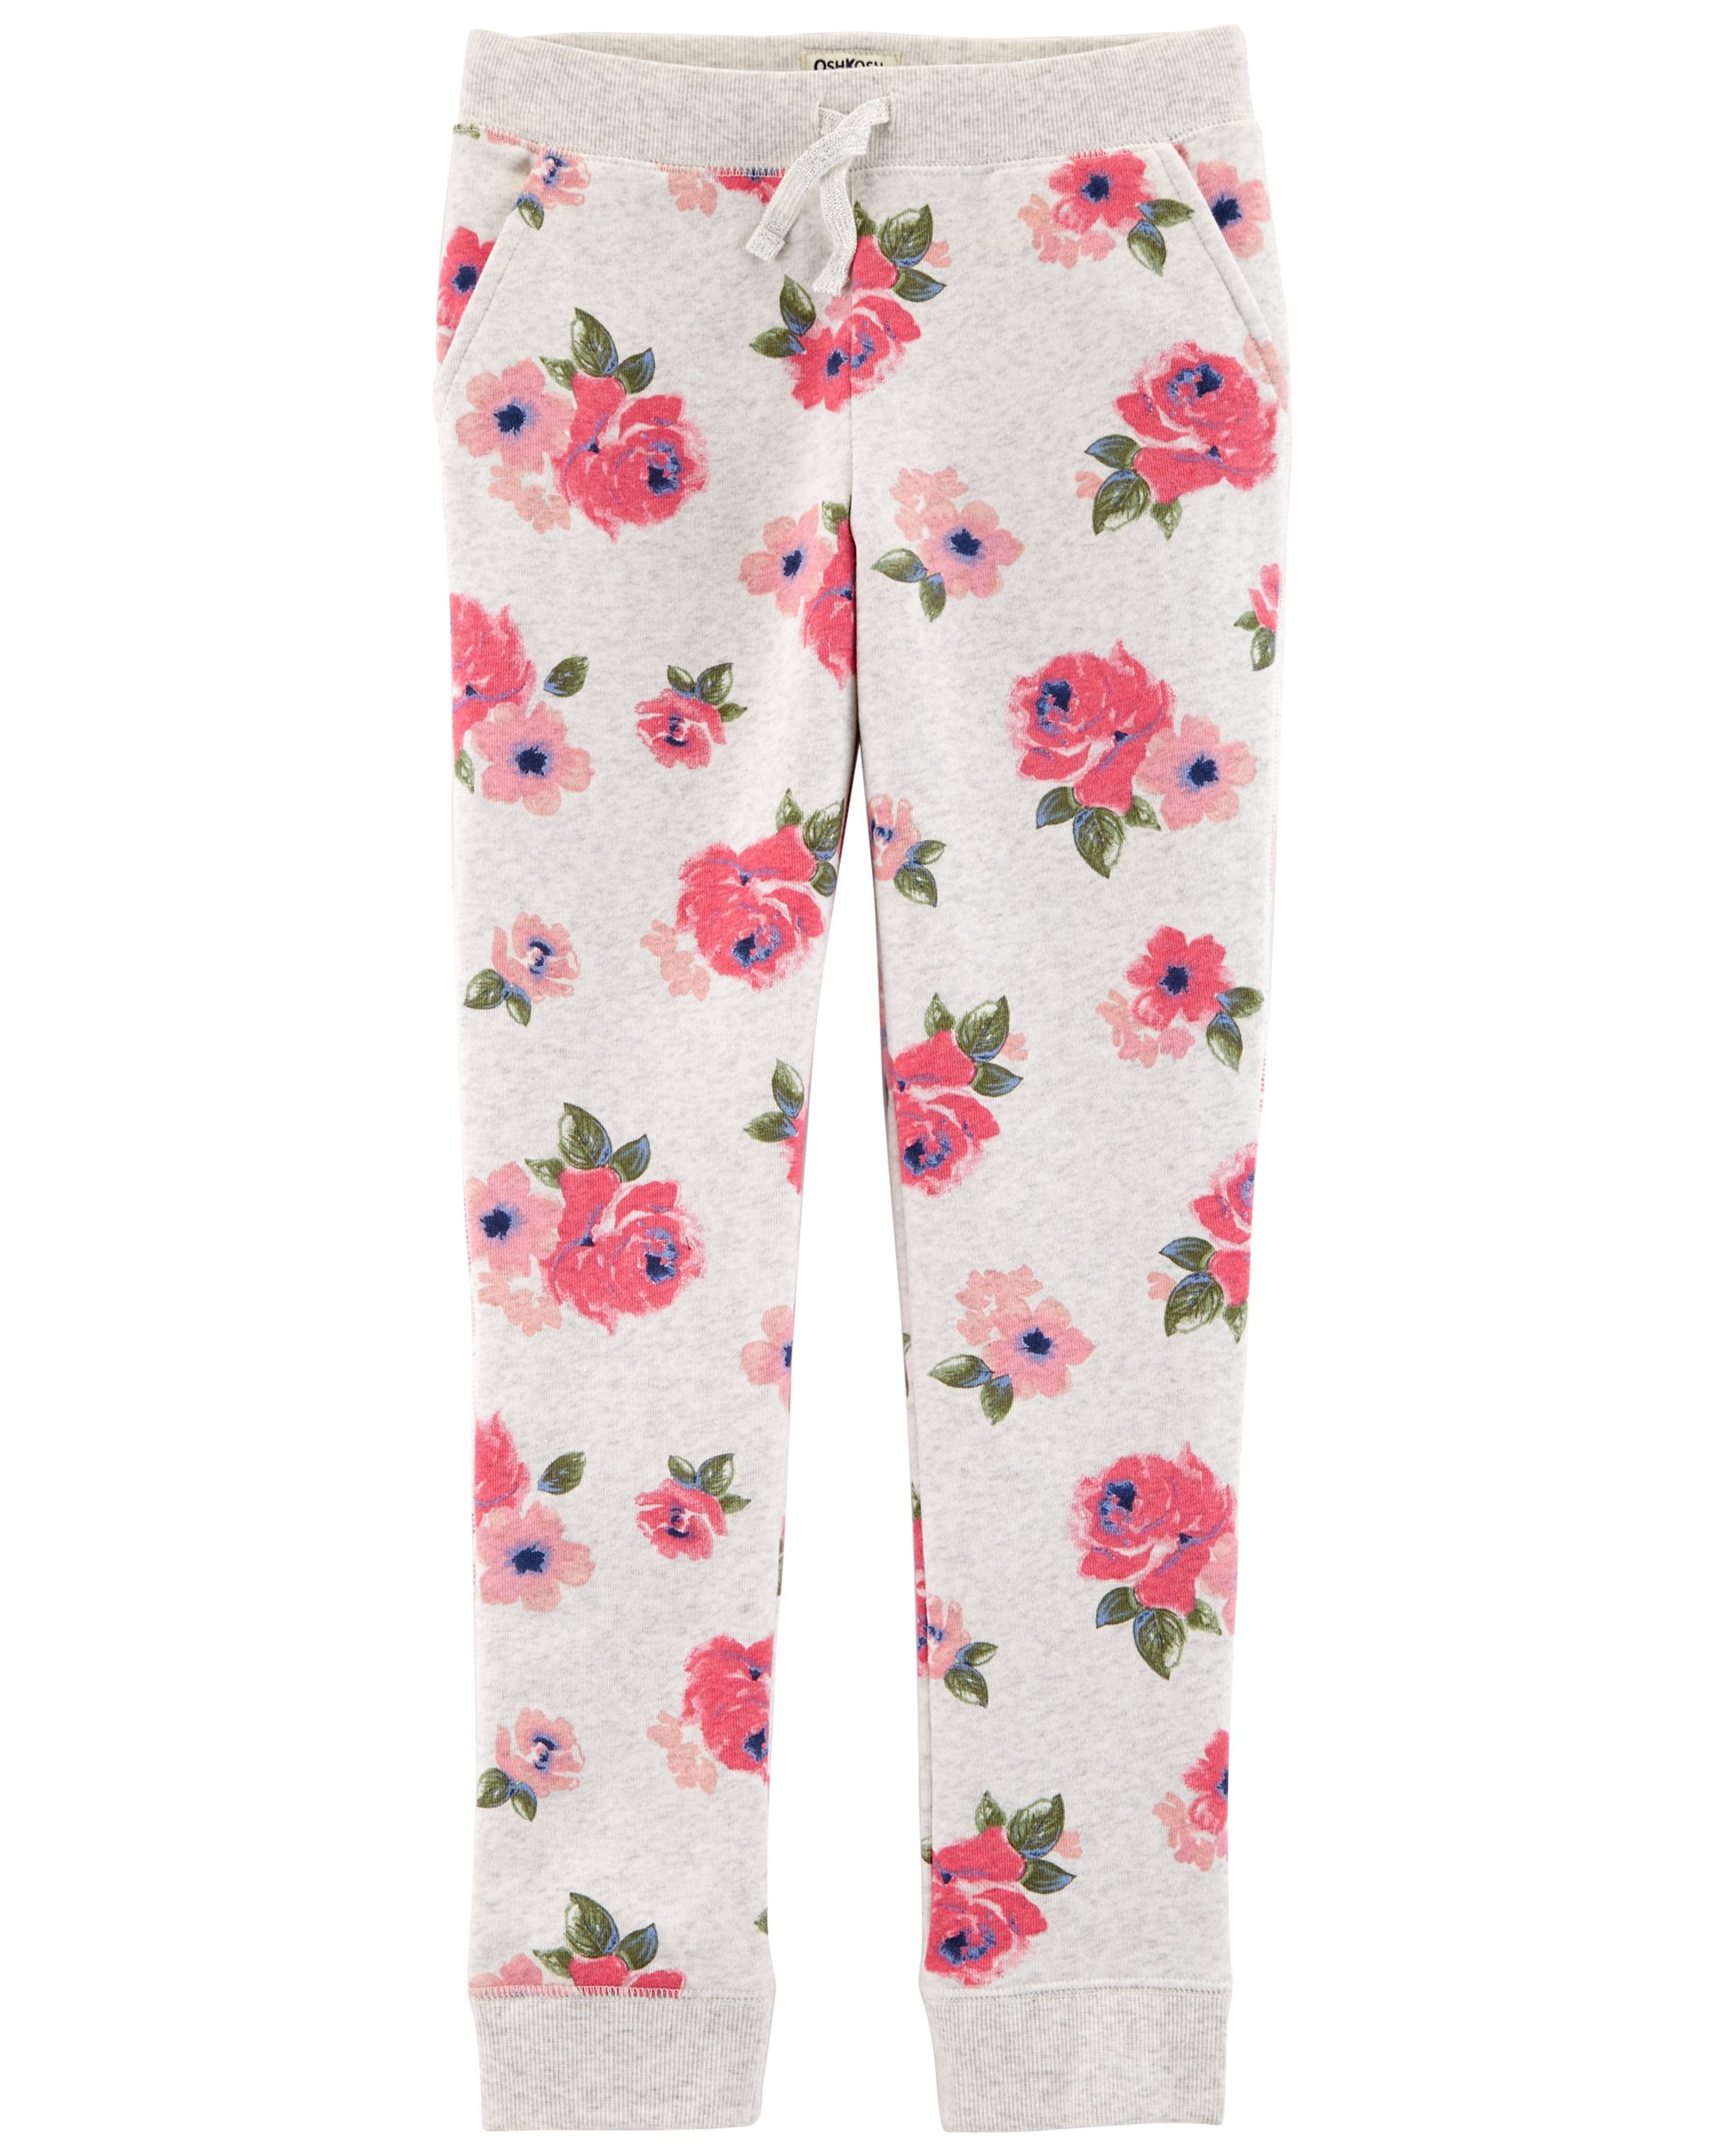 OshKosh B'Gosh Girls' Kids Fleece Jogger Pants, Grey Floral, 6-6X